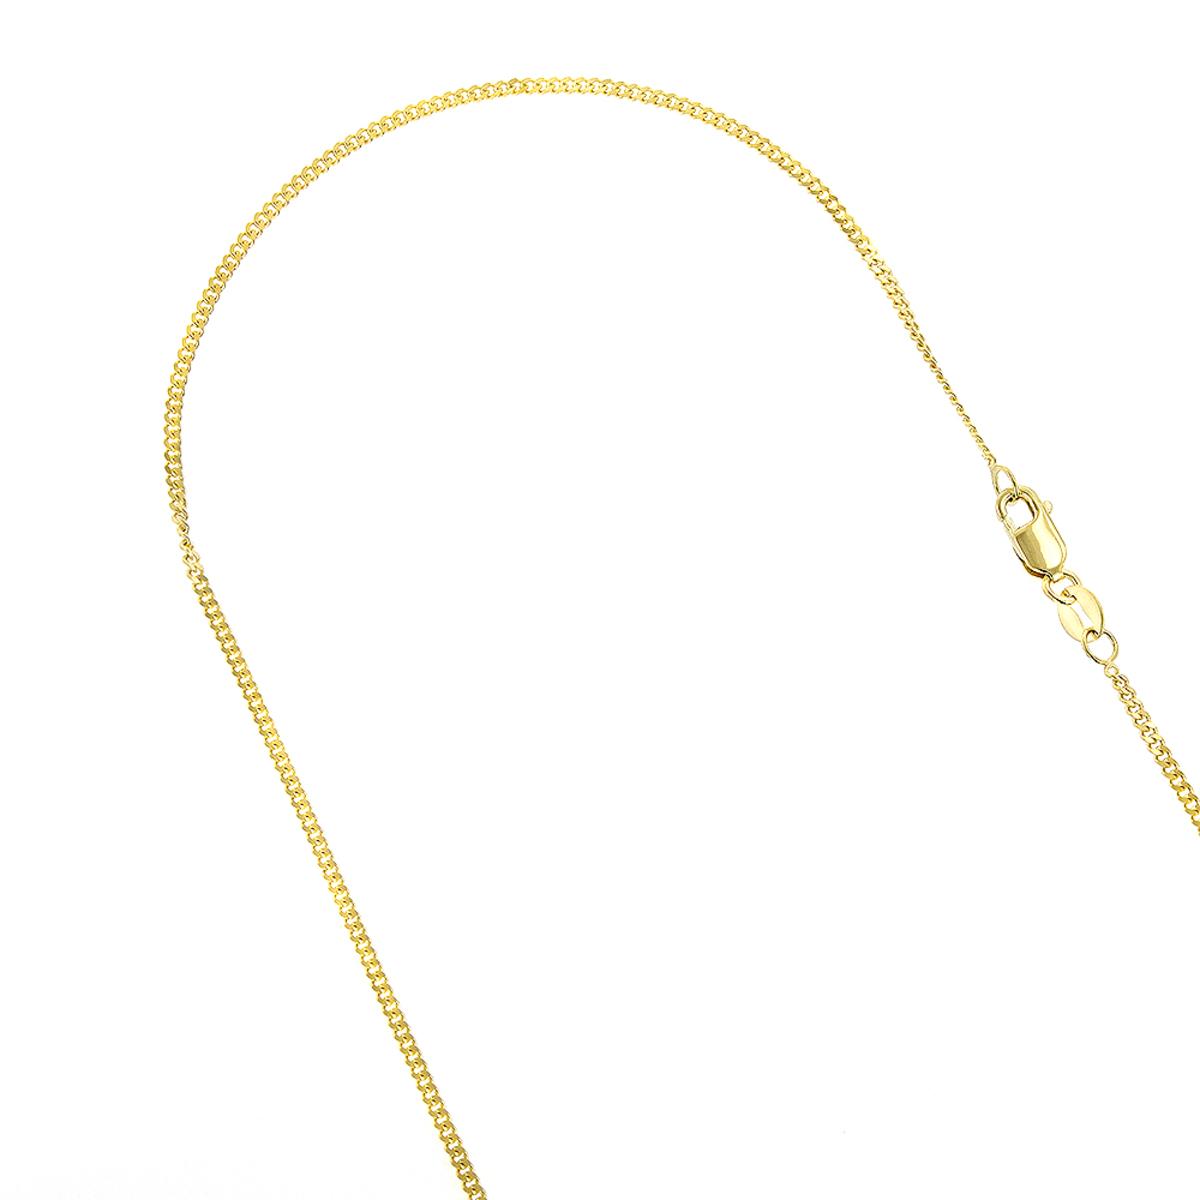 LUXURMAN Solid 14k Gold Curb Chain For Men & Women Gourmette 1.5mm